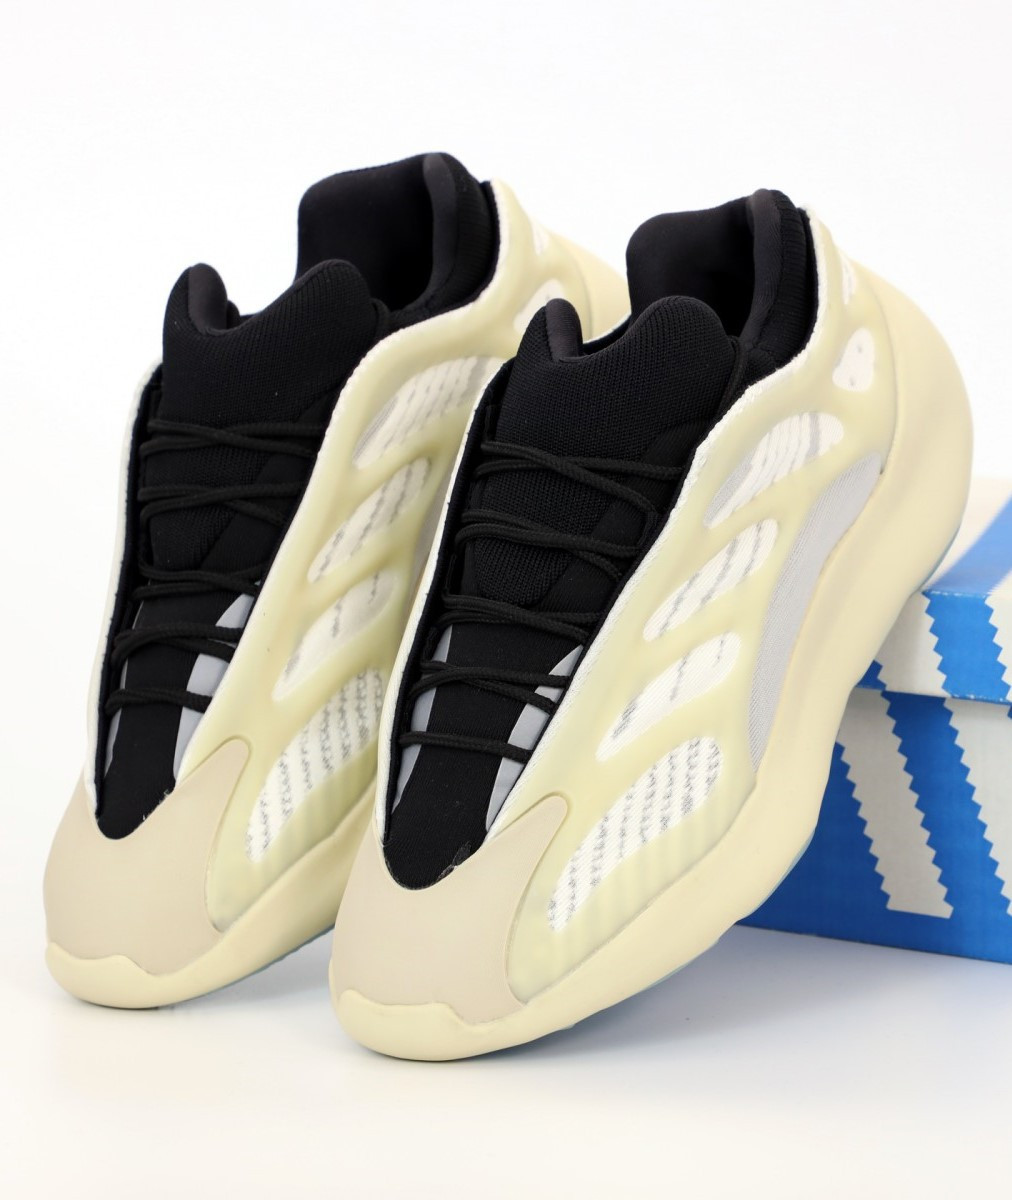 Мужские кроссовки ADIDAS YEEZY 700 V3 AZAEL White (Изи белые)